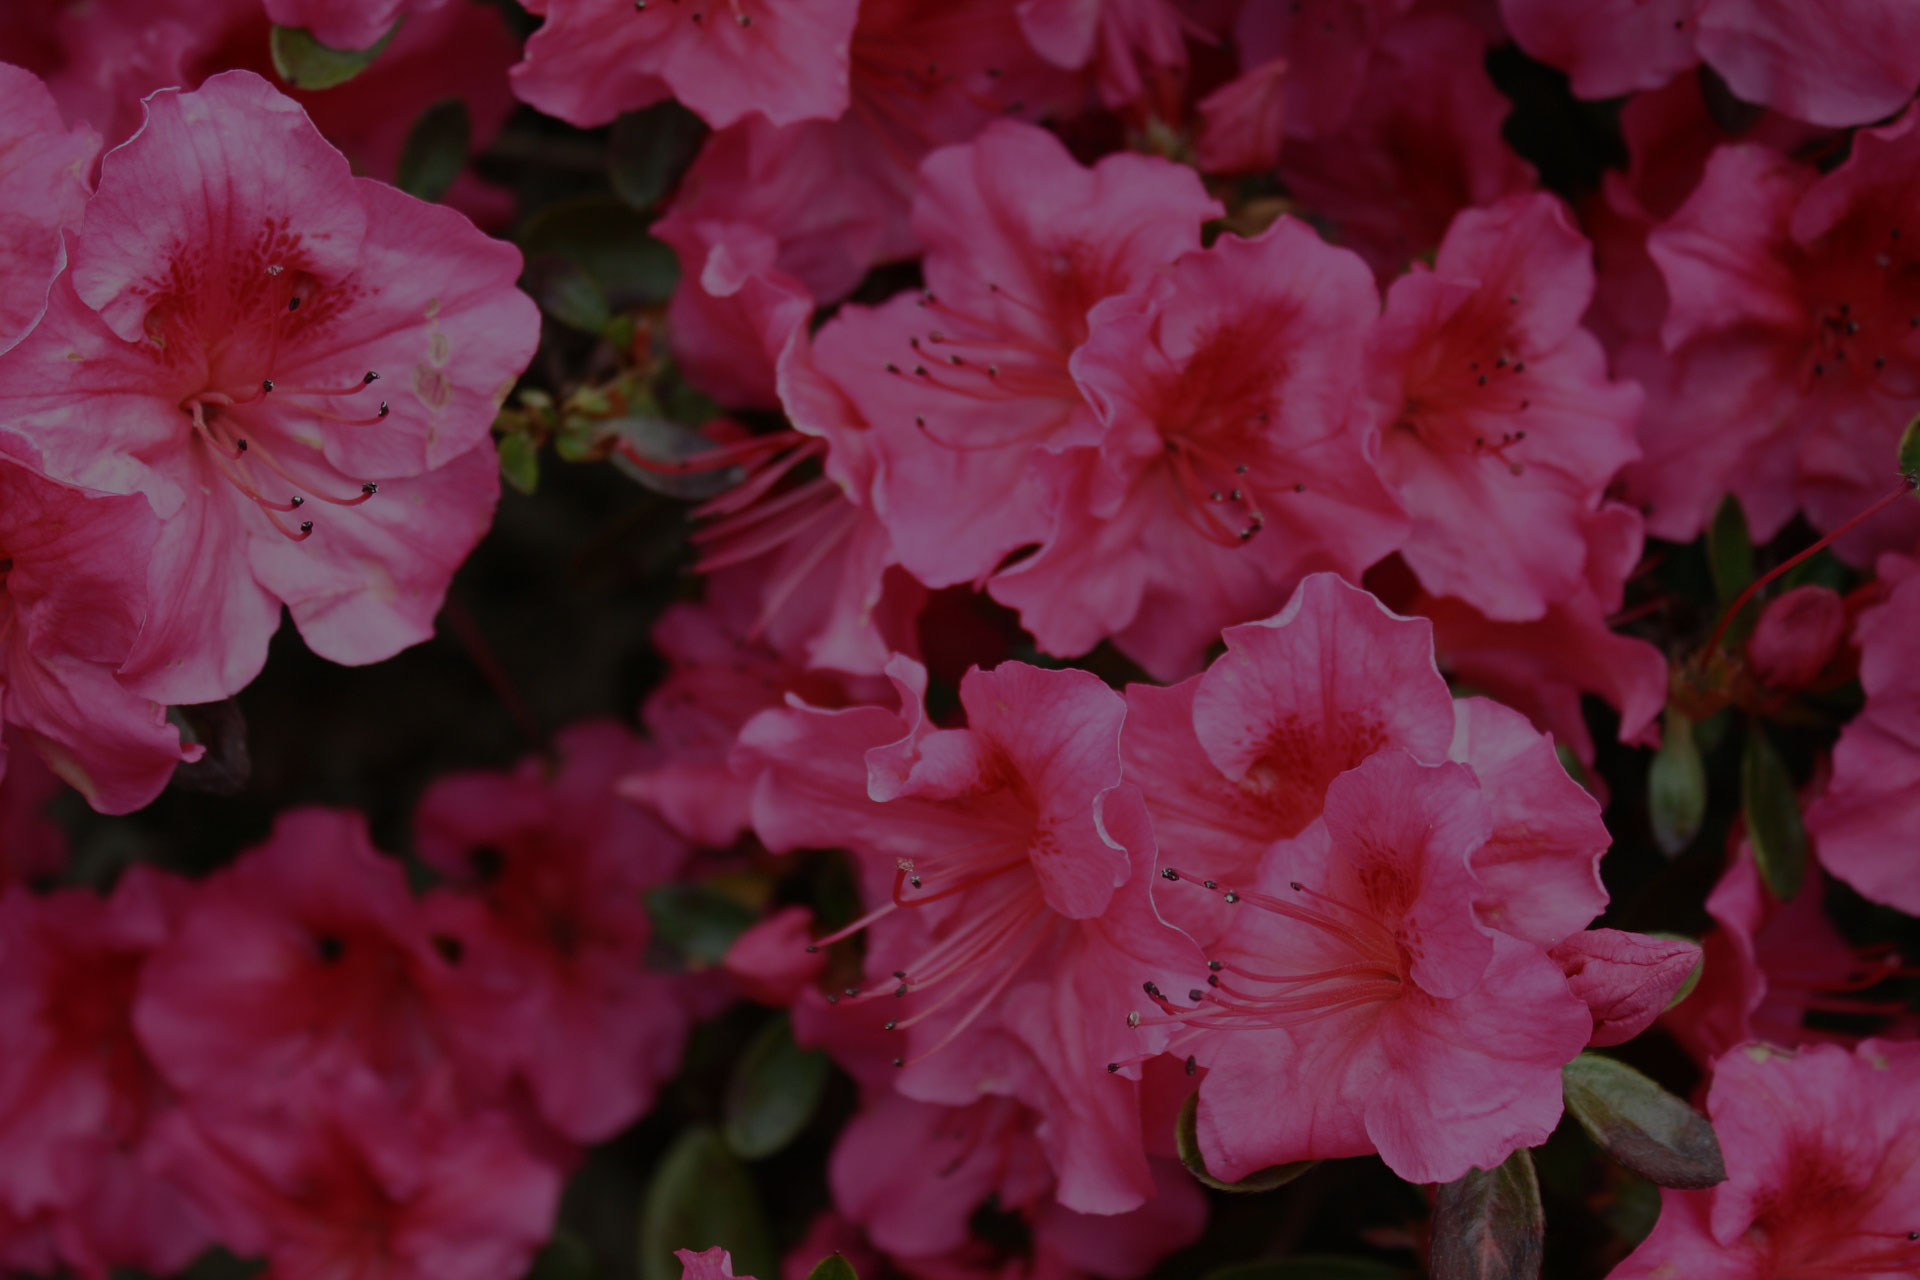 Blossom Rhododenron Pink Flowers Garden Bloom